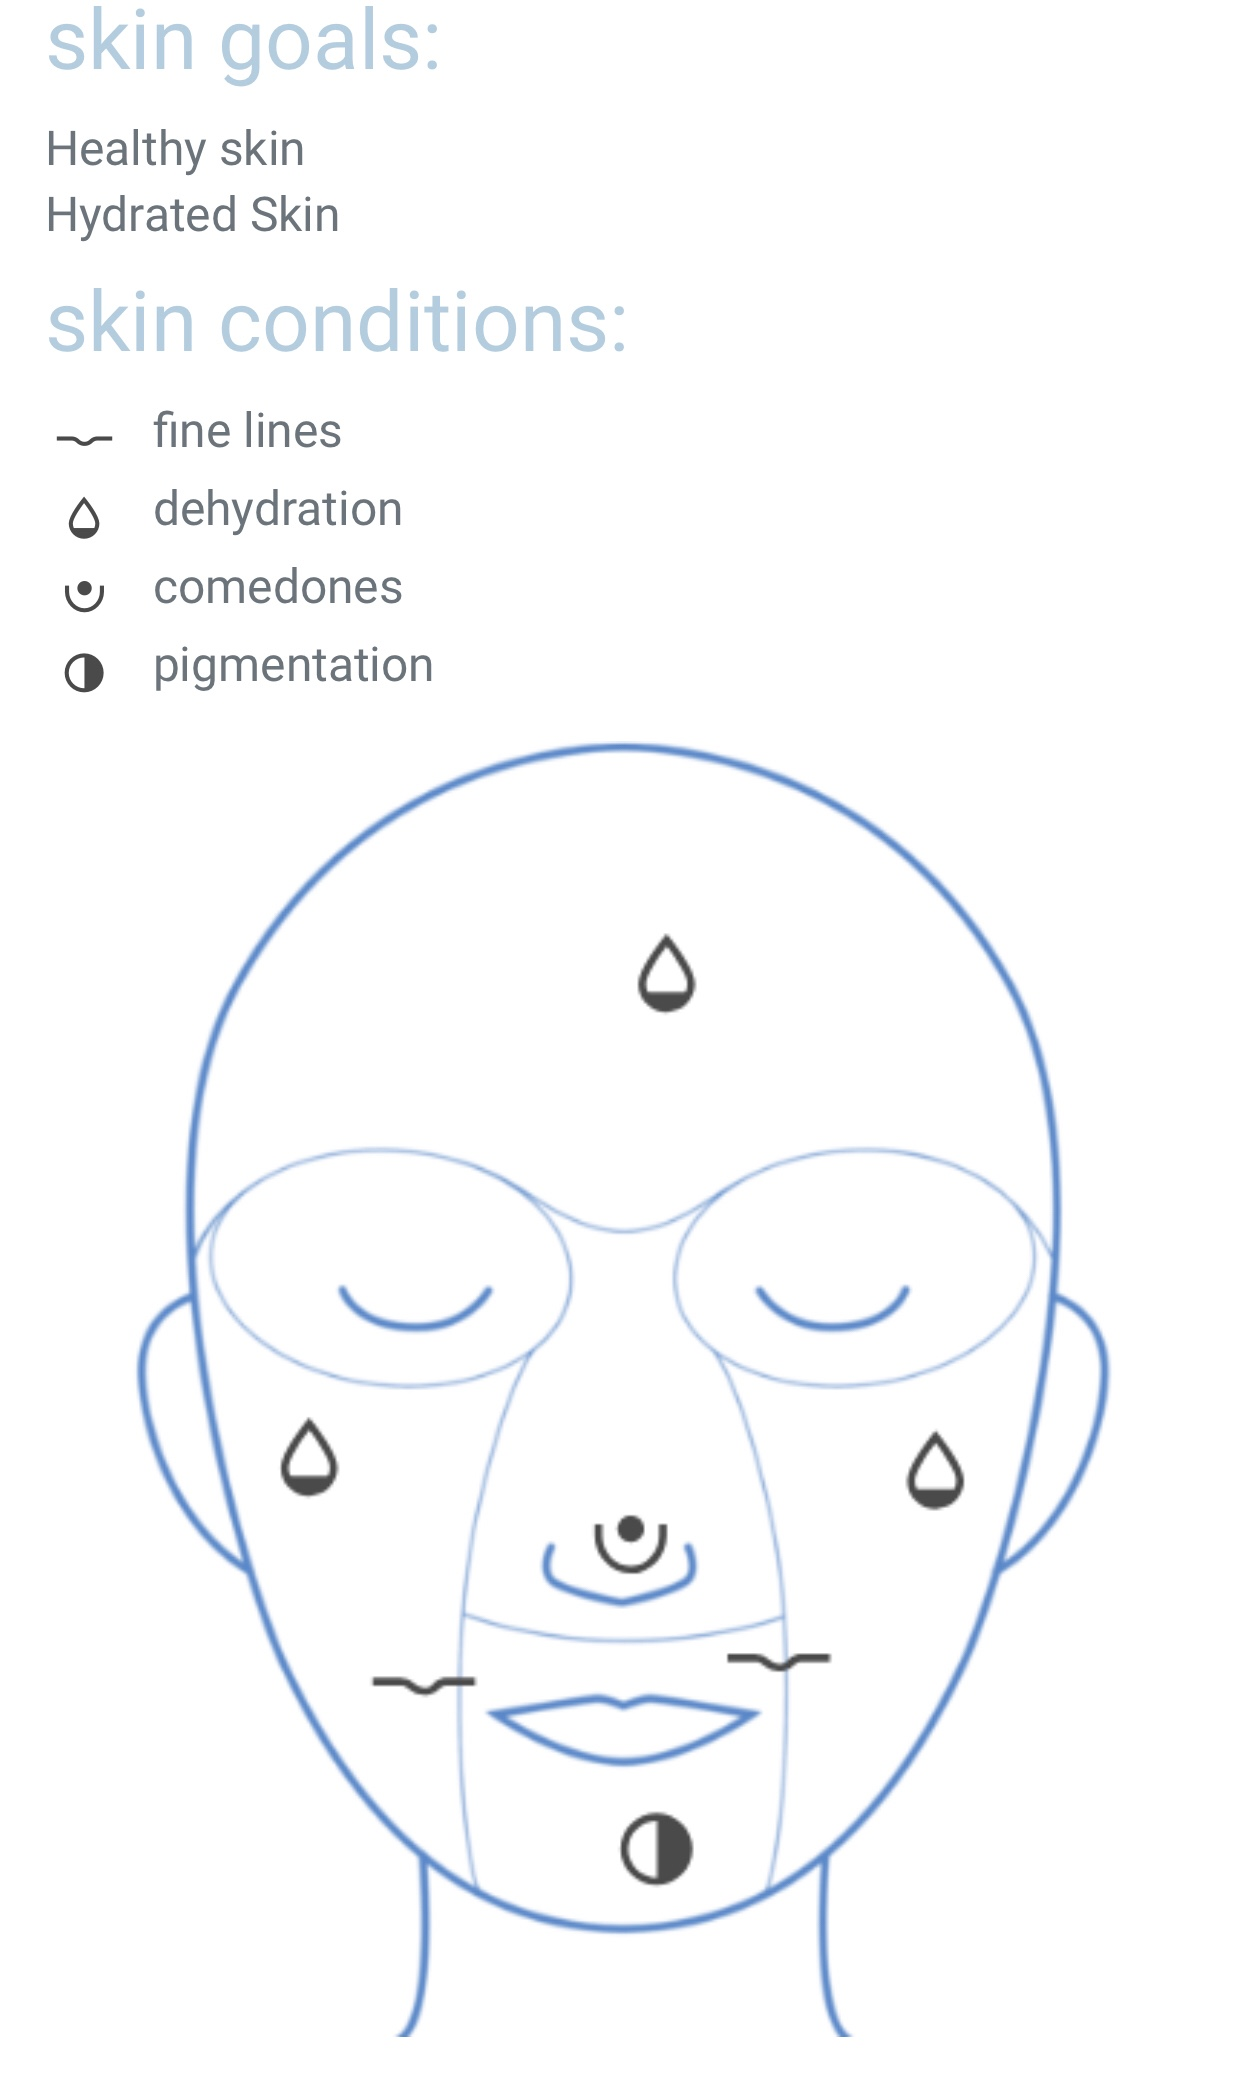 Dermalogica Facemapping Prescription